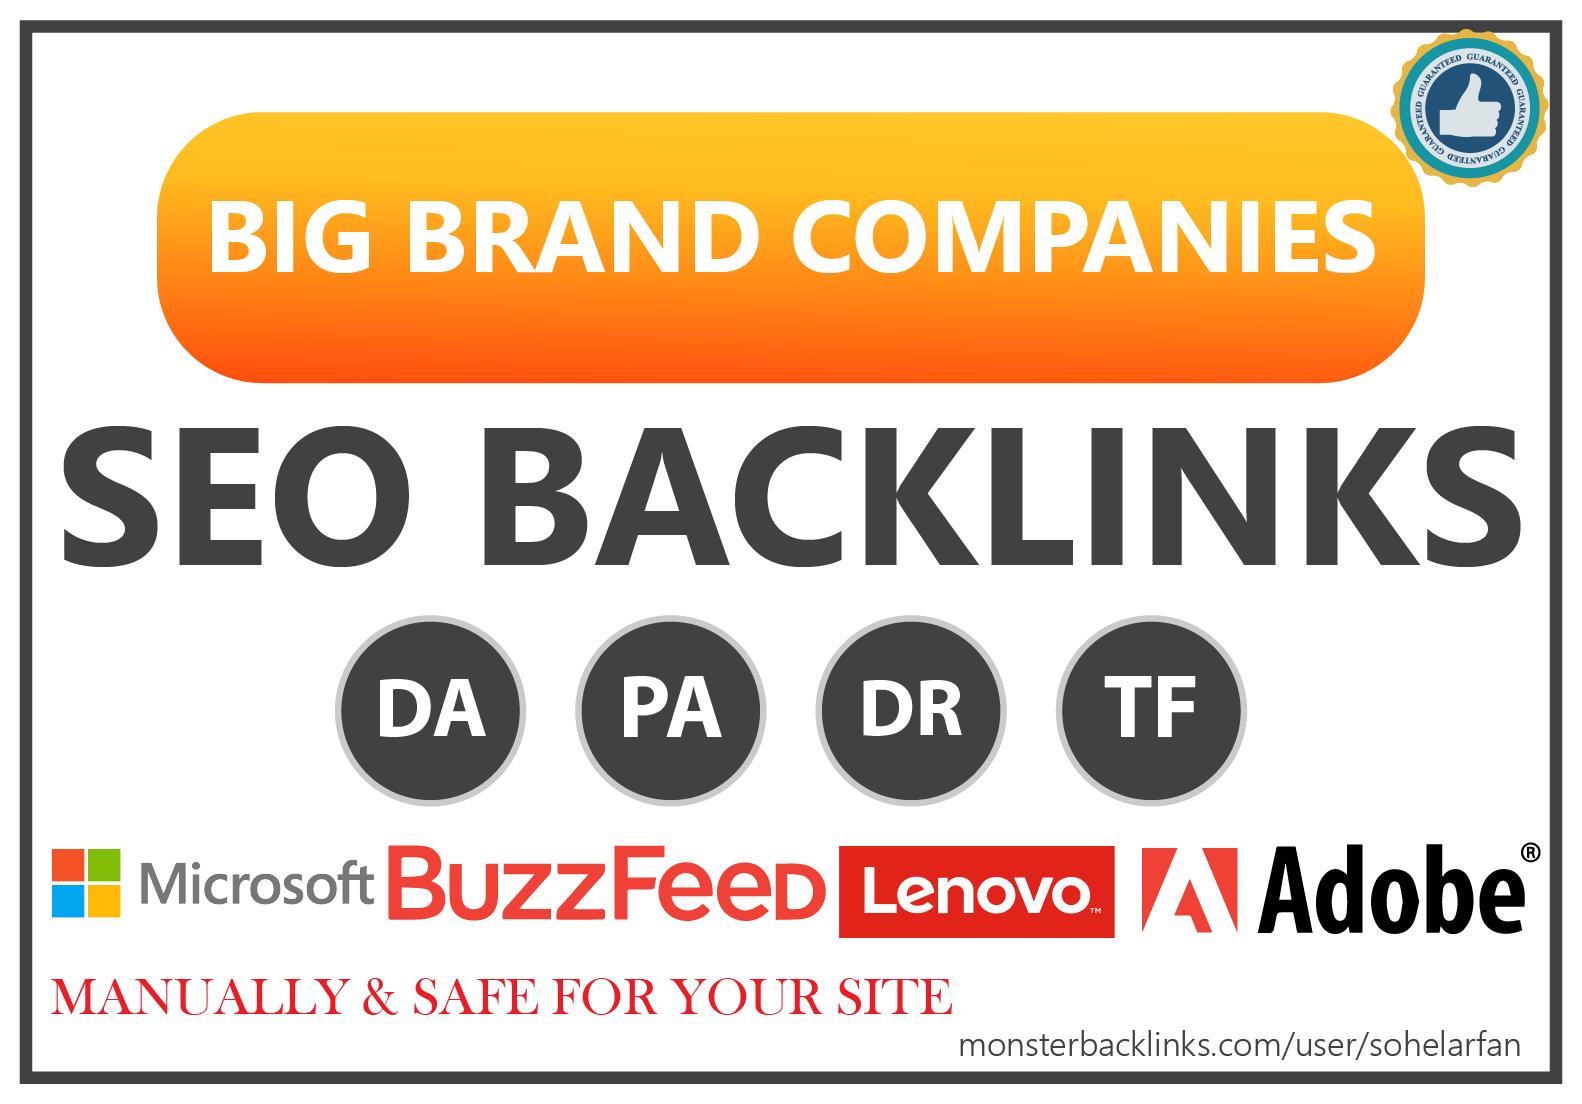 150 Big Brand Companies SEO Profile Backlinks Huge Boost in Search Engine